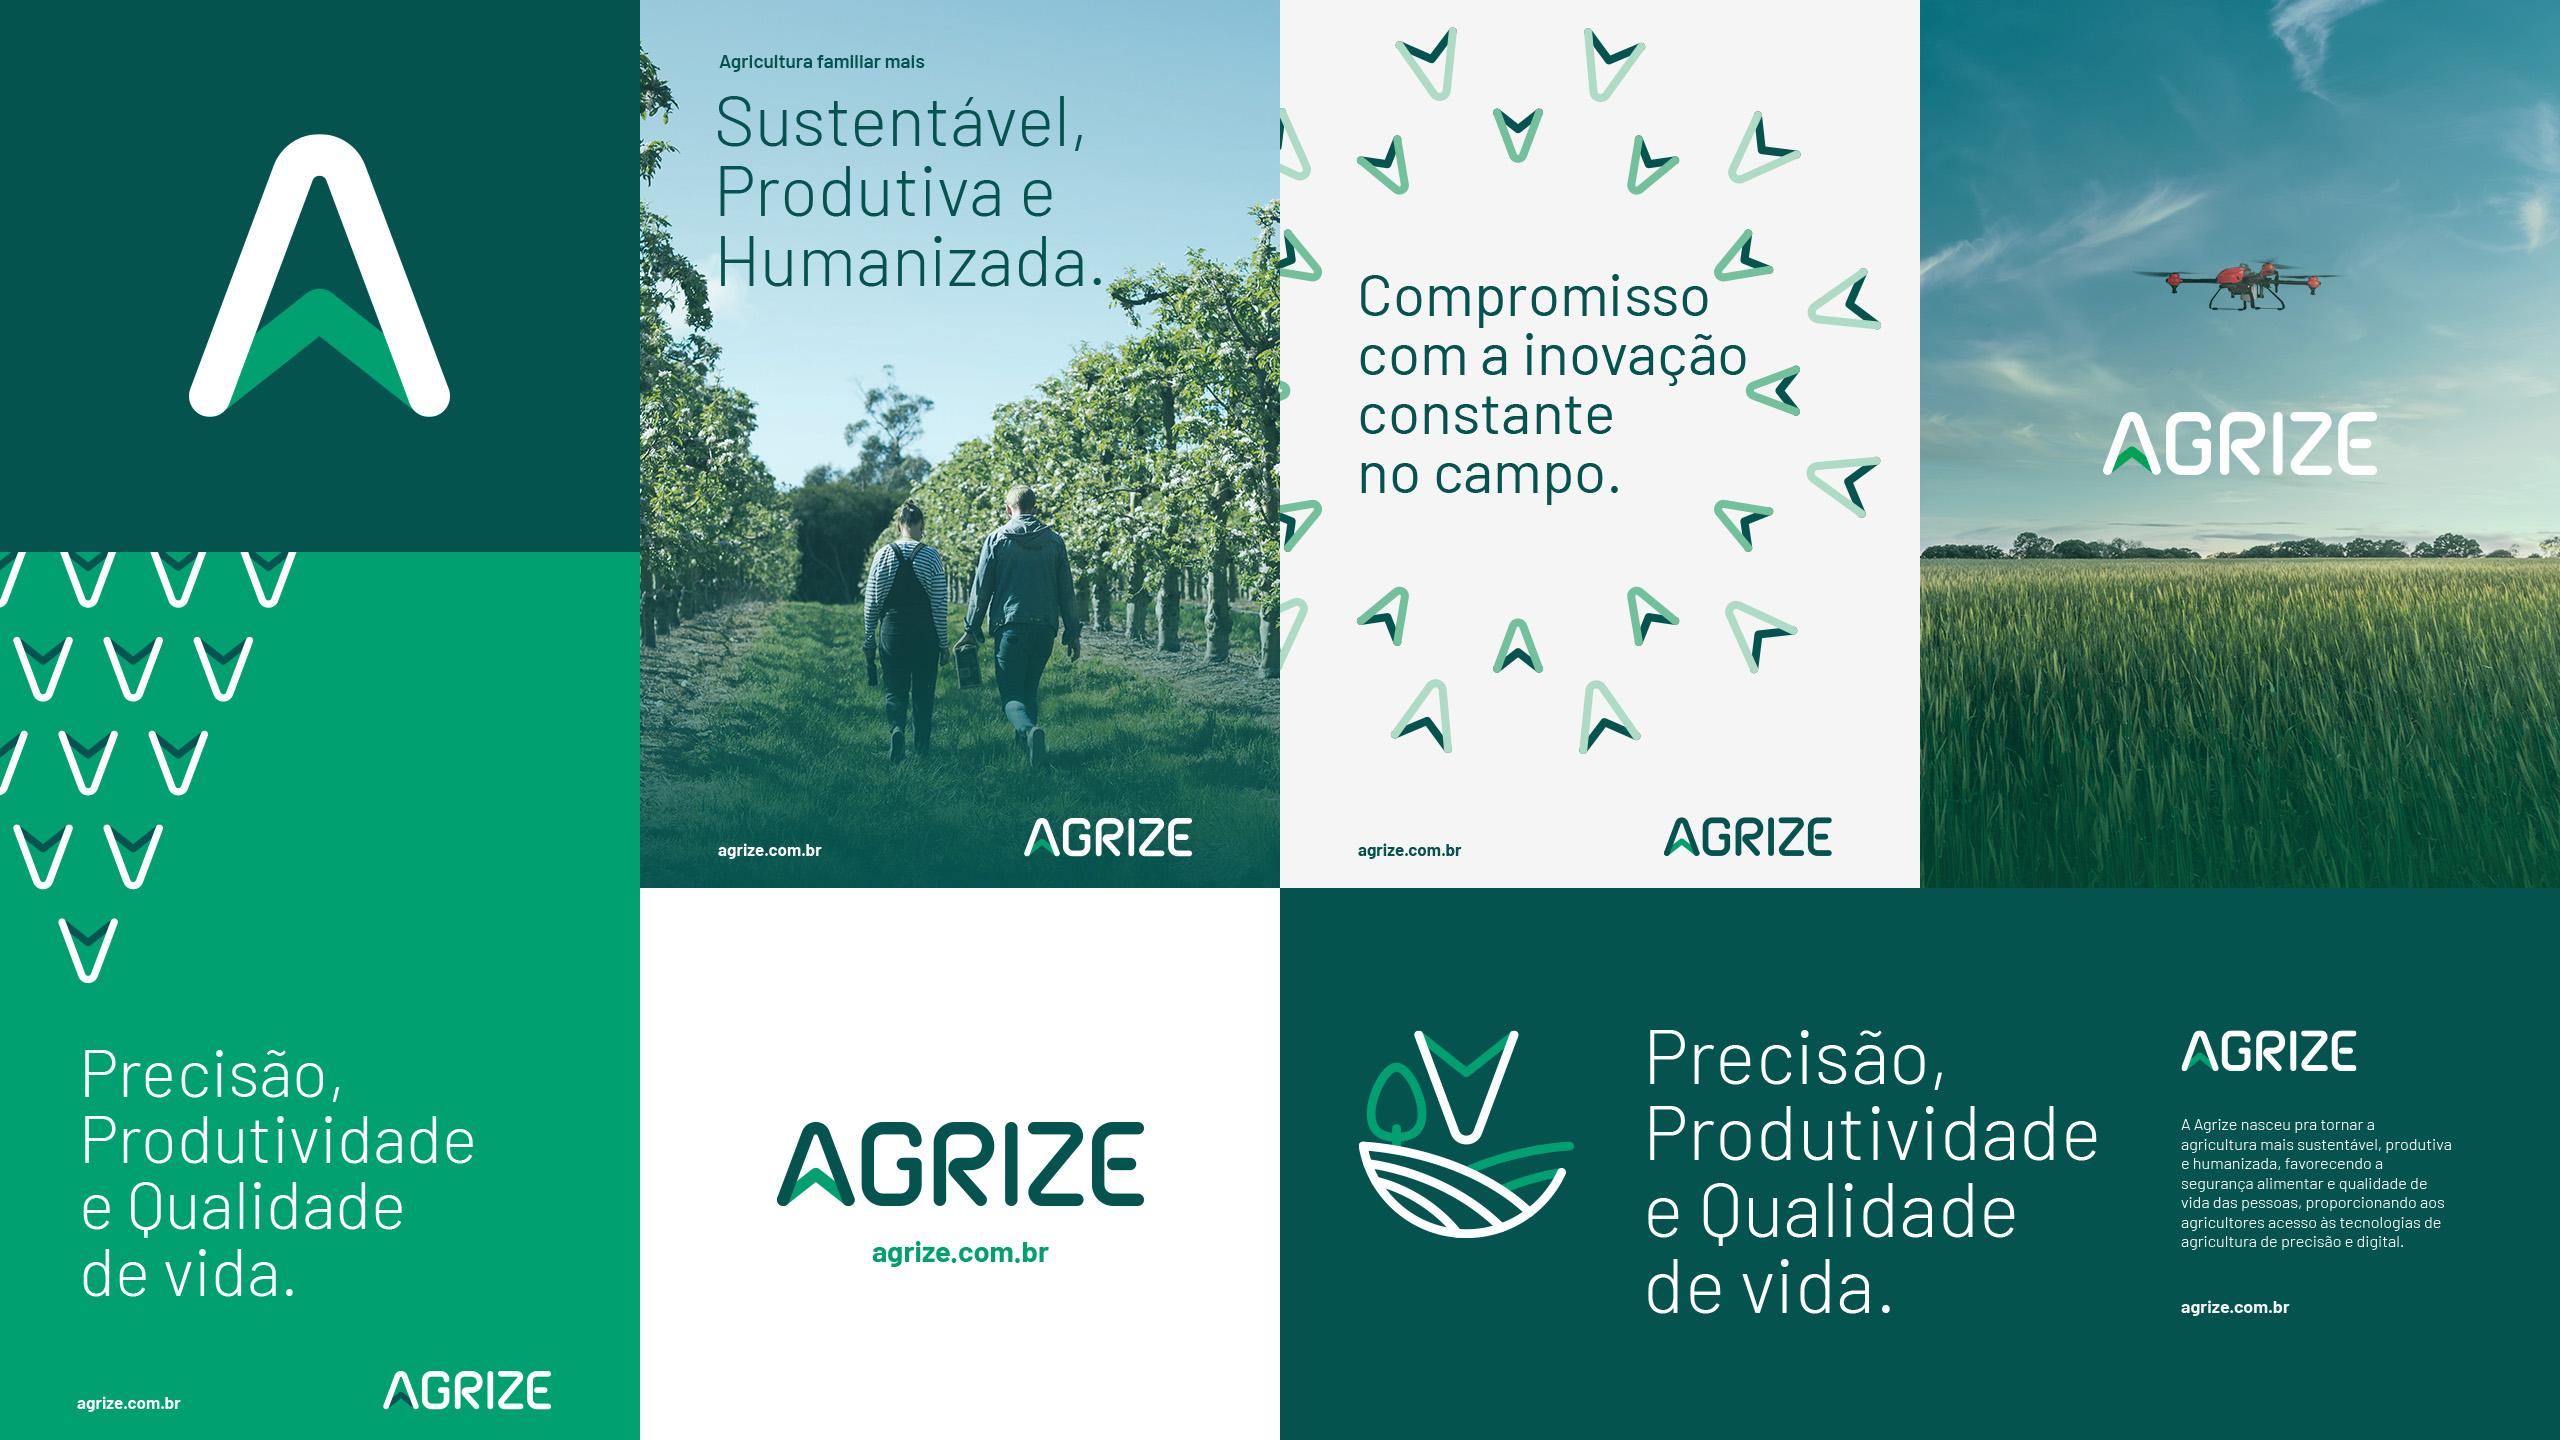 firmorama_agrize_04